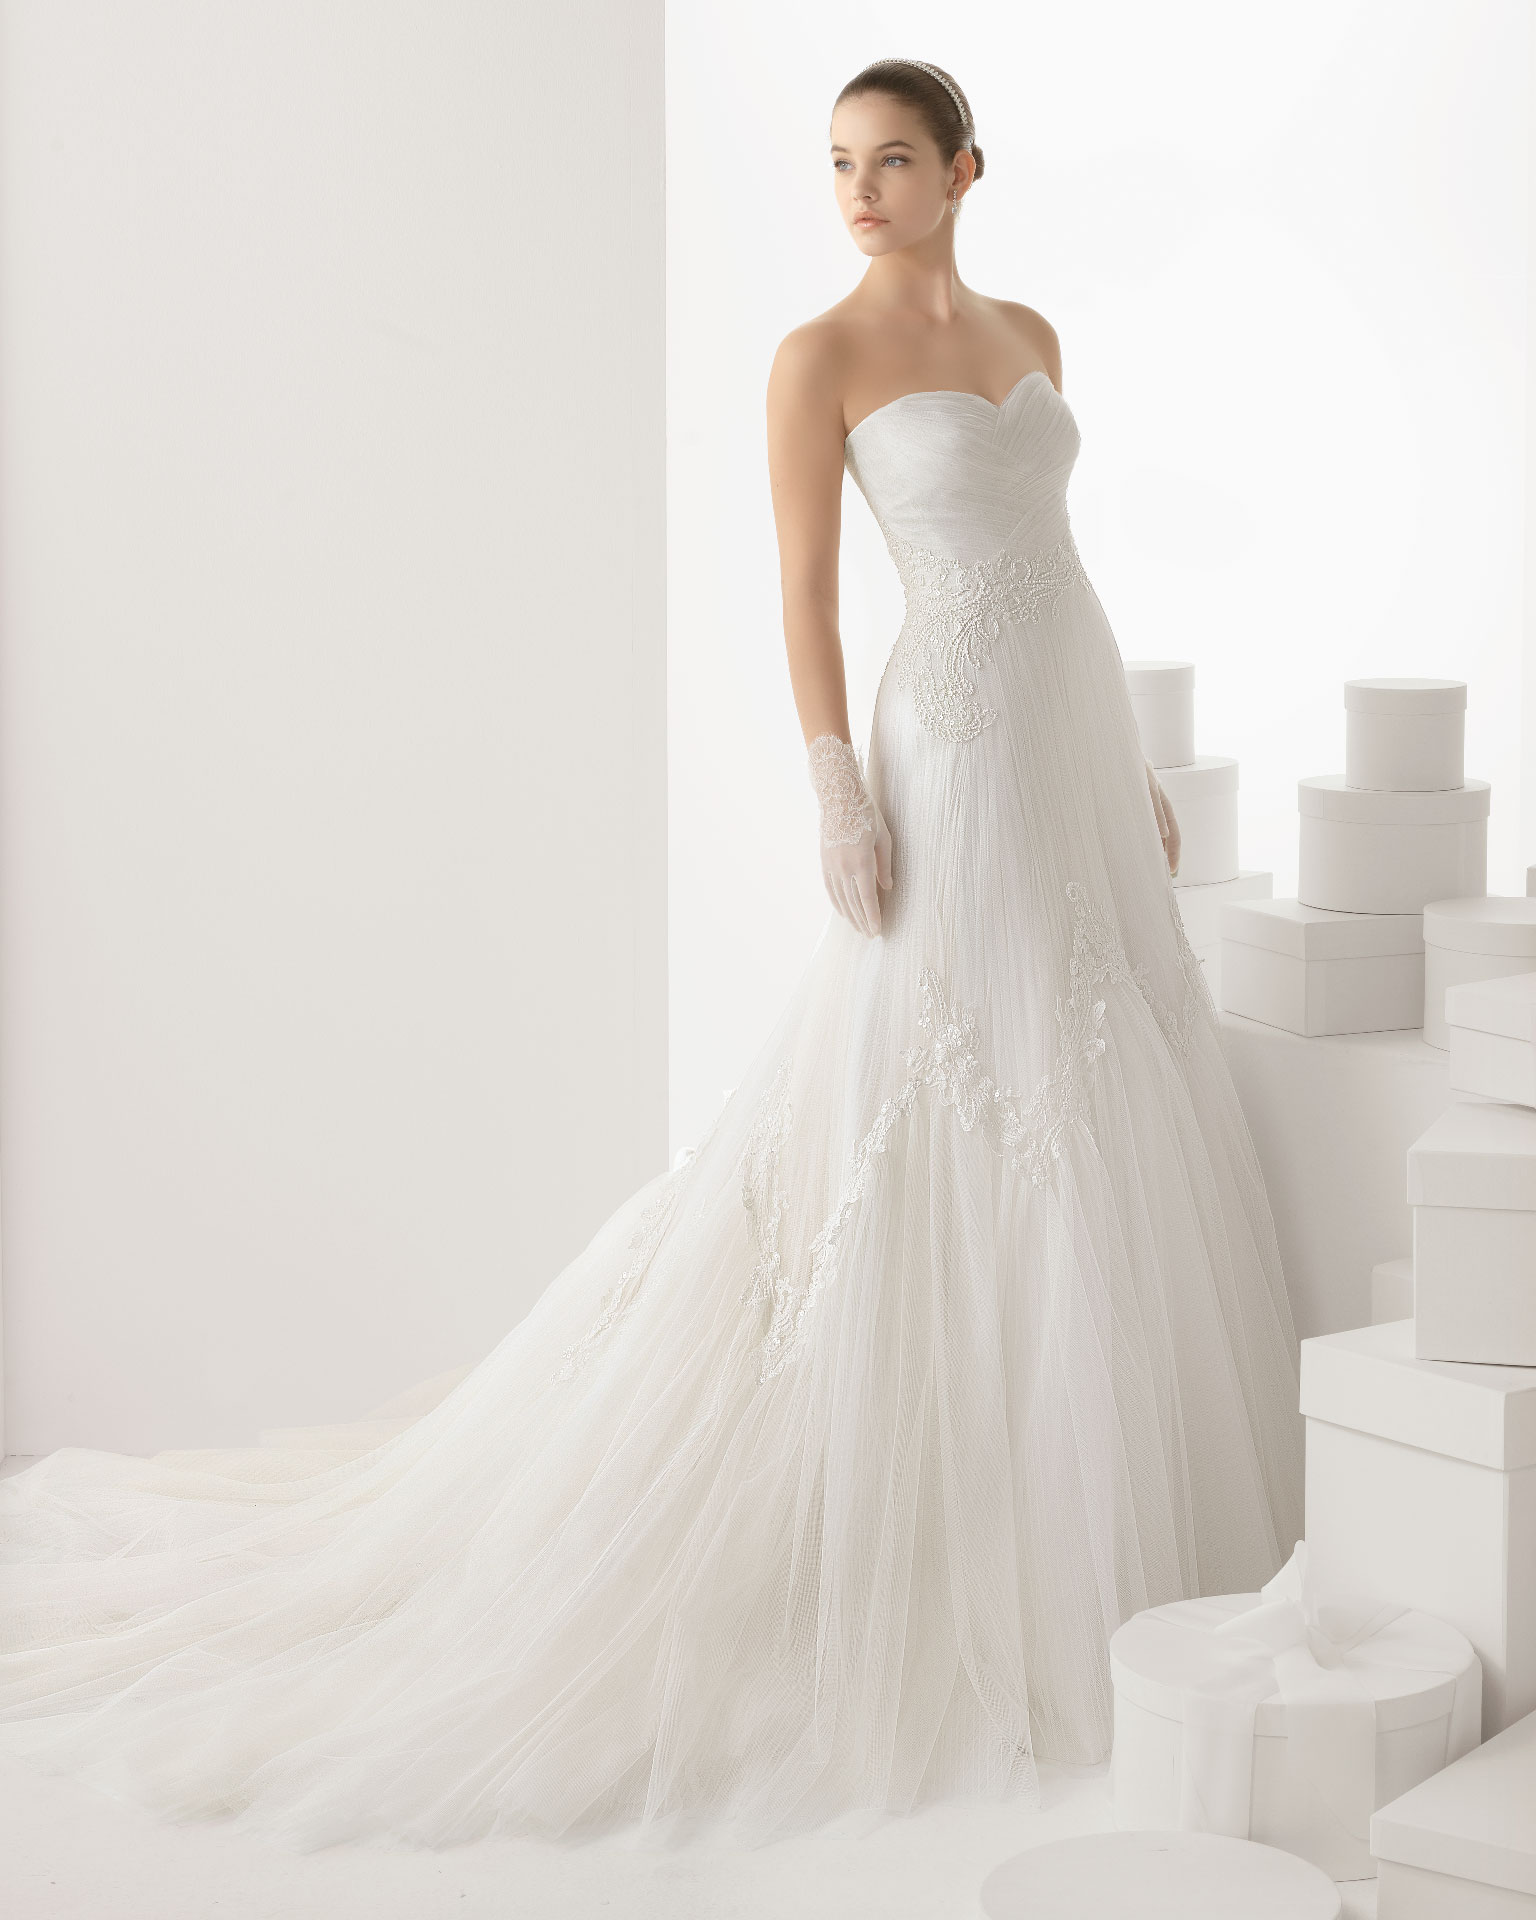 Rosa clara wedding dress 2014 bridal carlota for Rosa clara wedding dresses 2014